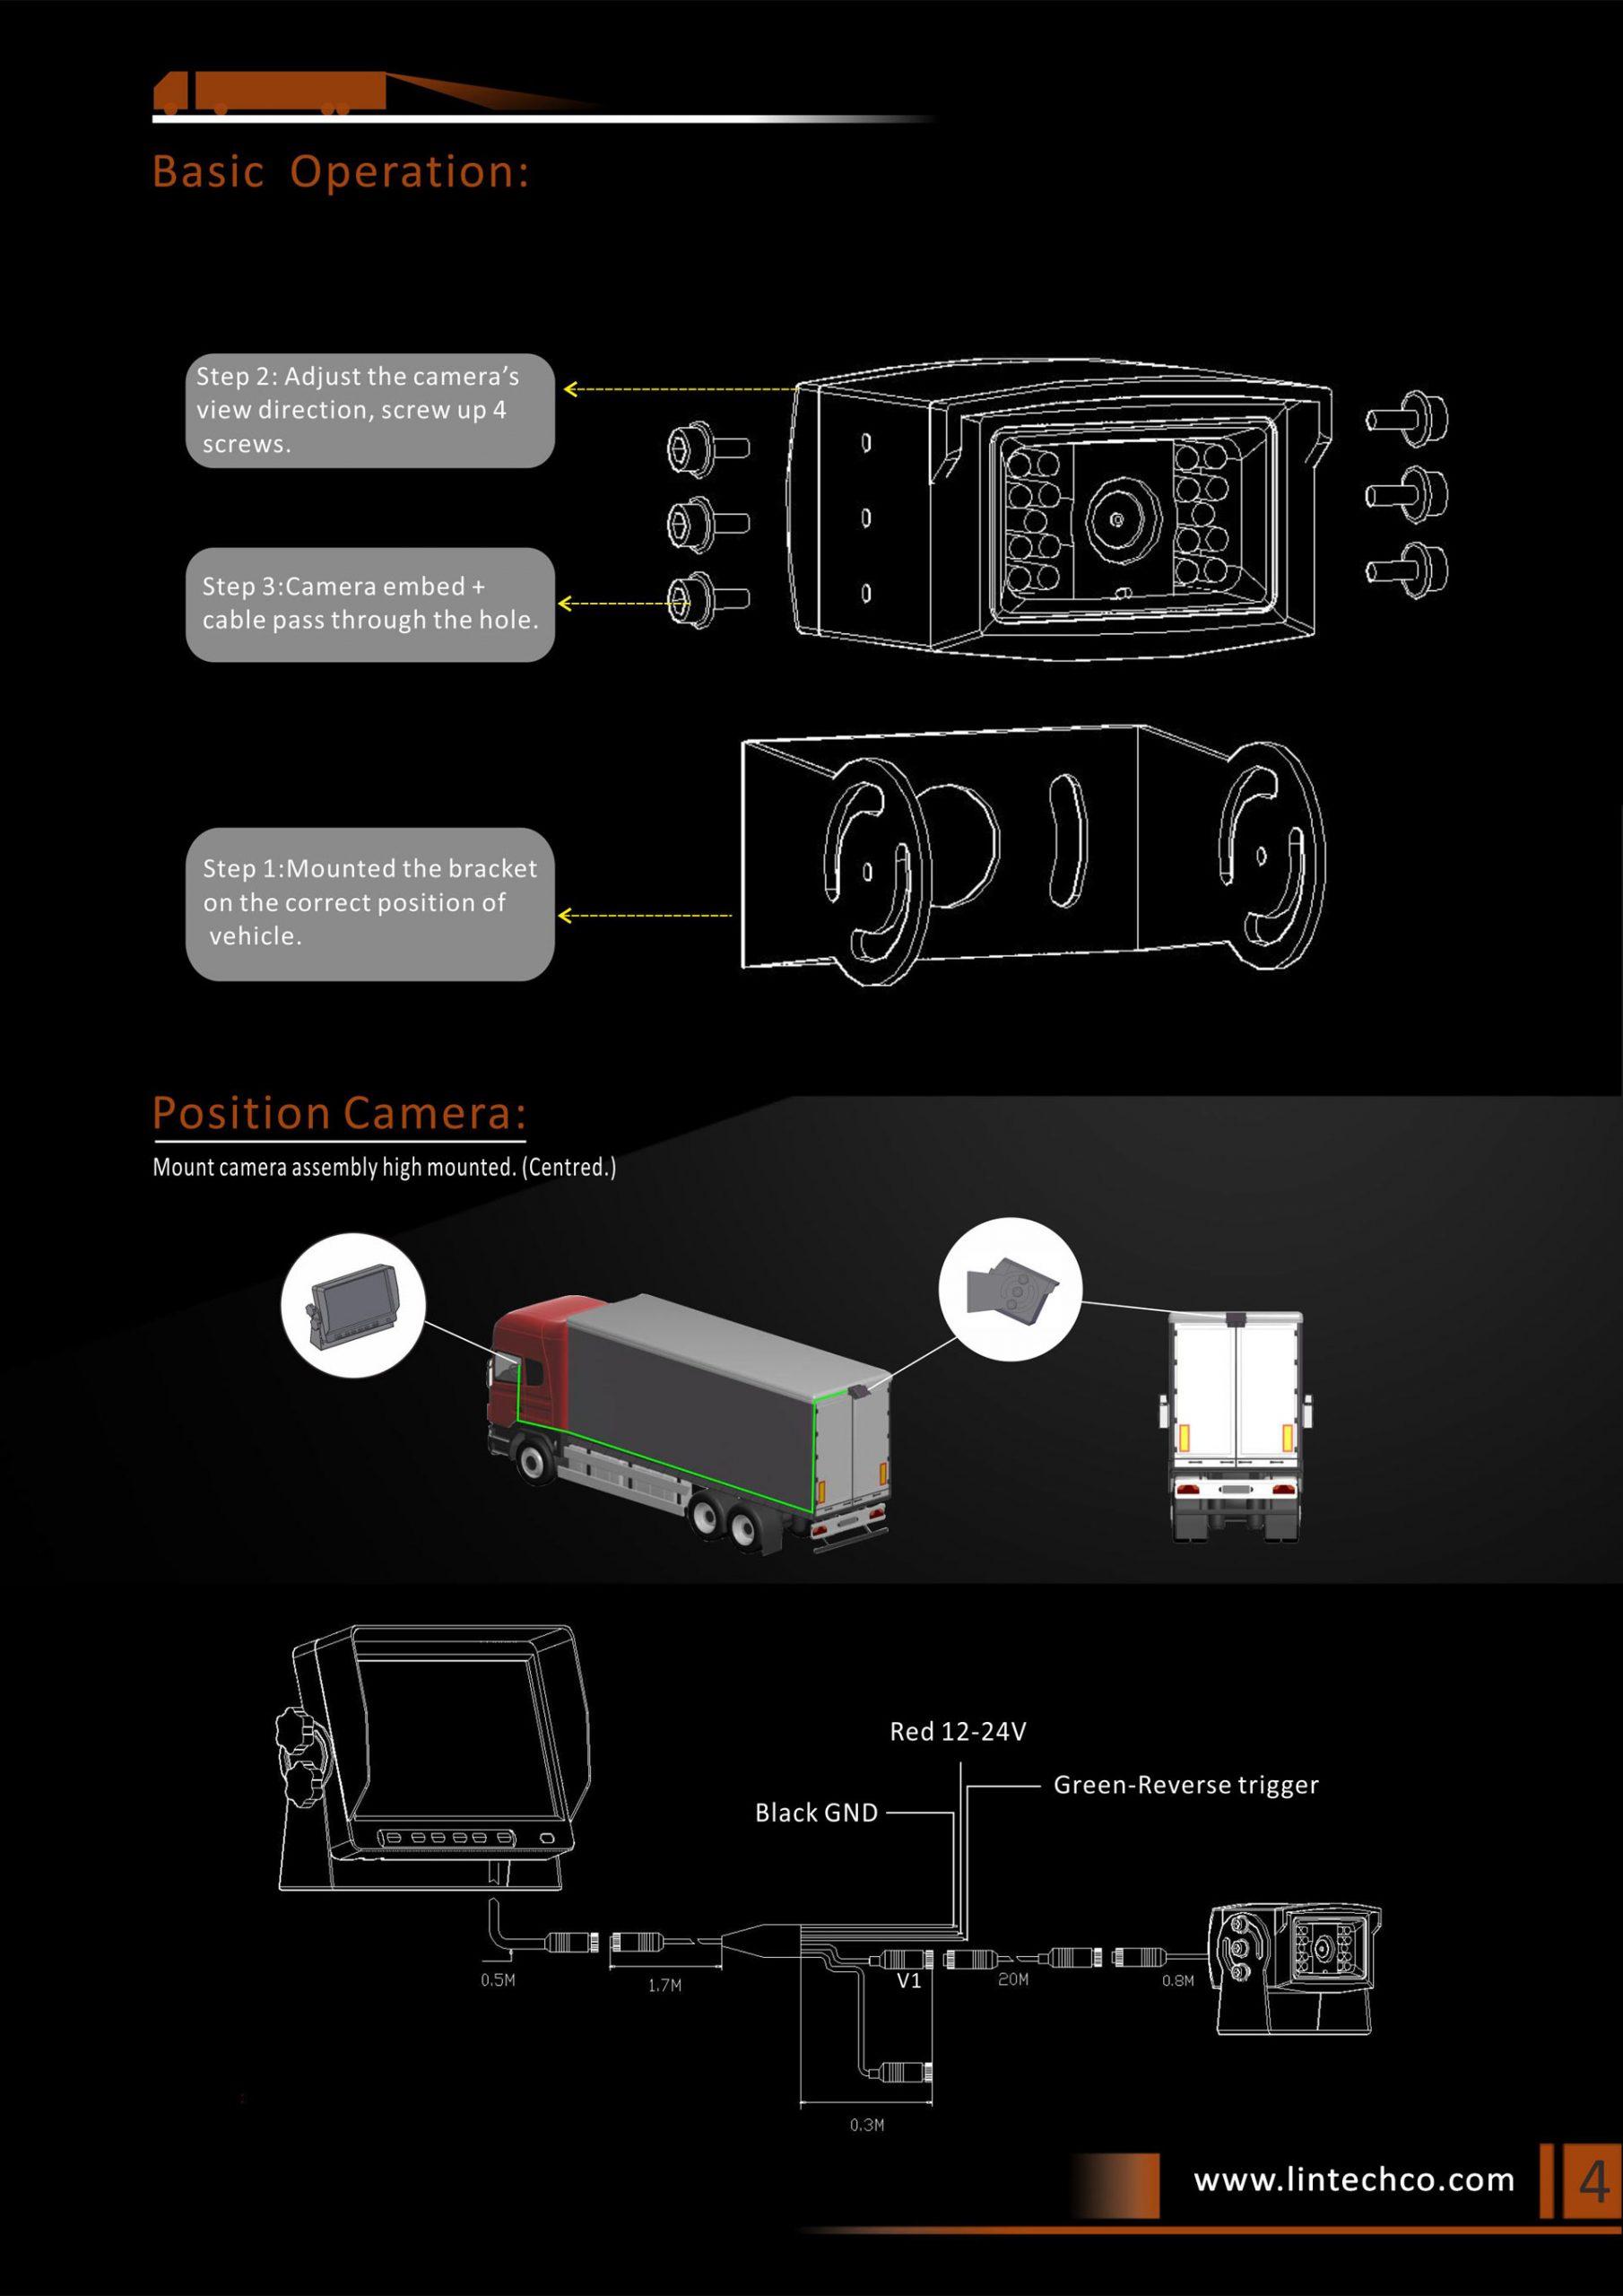 4.18pcs-IR-LED-Night-Vision-Waterproof-Rear-View-Camera